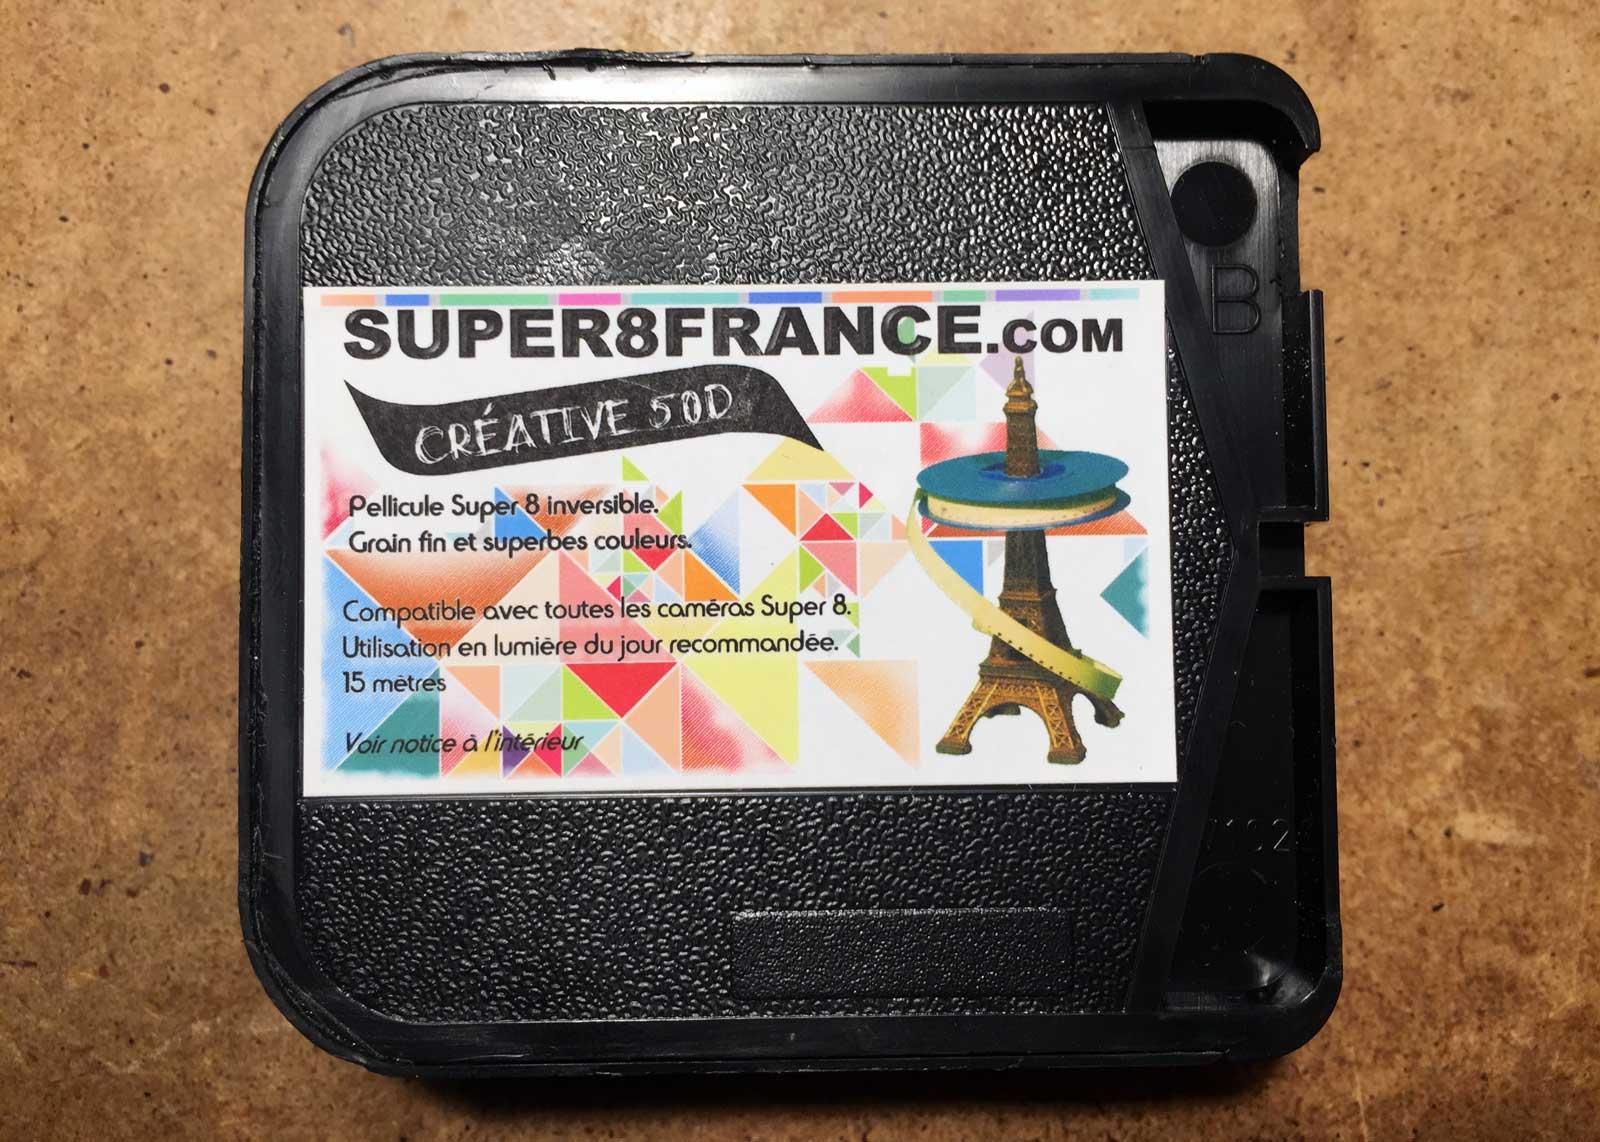 Kurzes, dreckiges Vergnügen: Der Créative 50D aus Frankreich